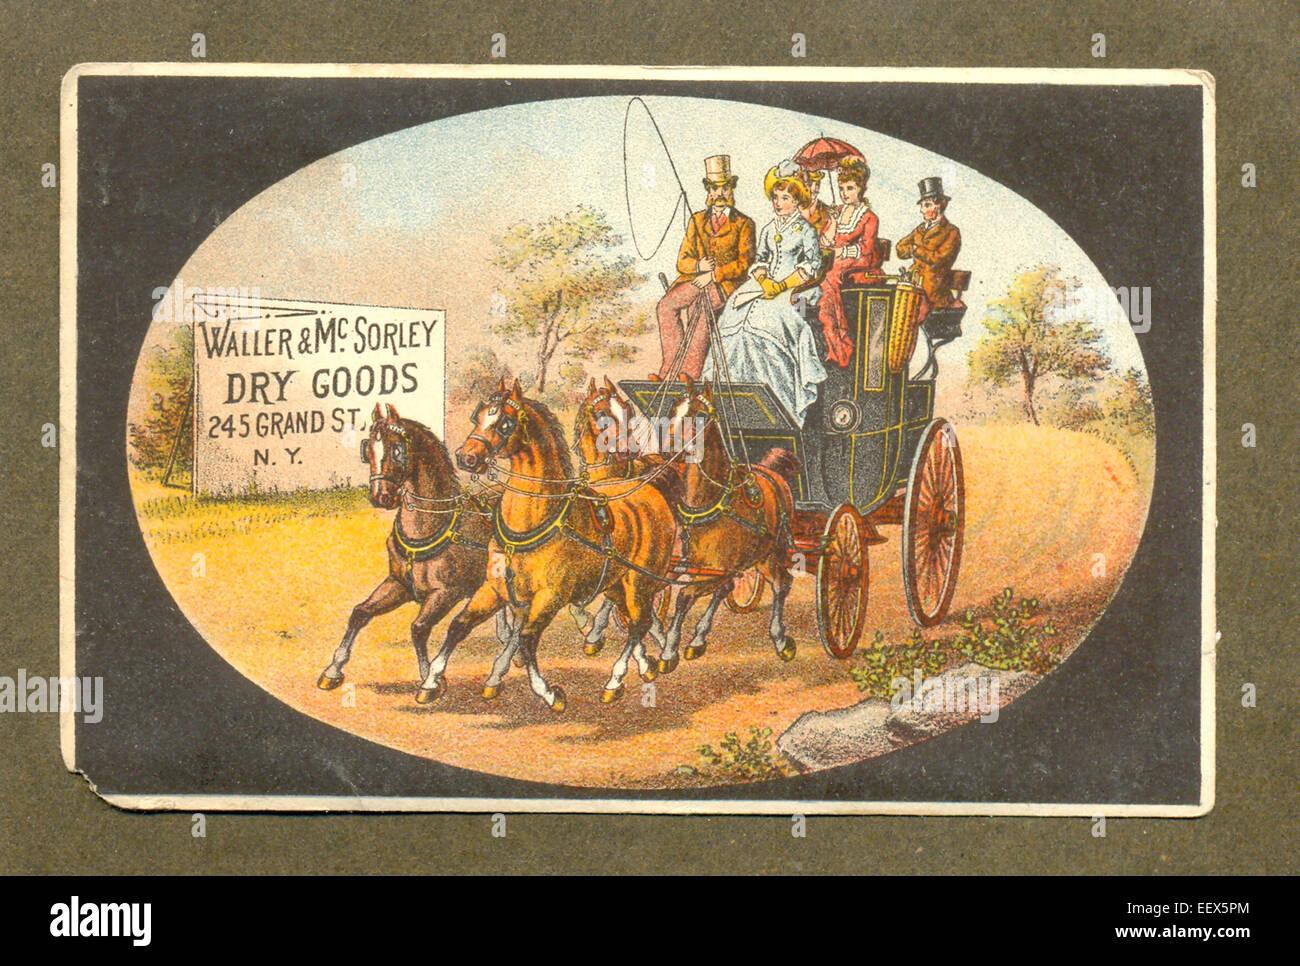 American scheda commerciale per la parete & McSorley Foto Stock